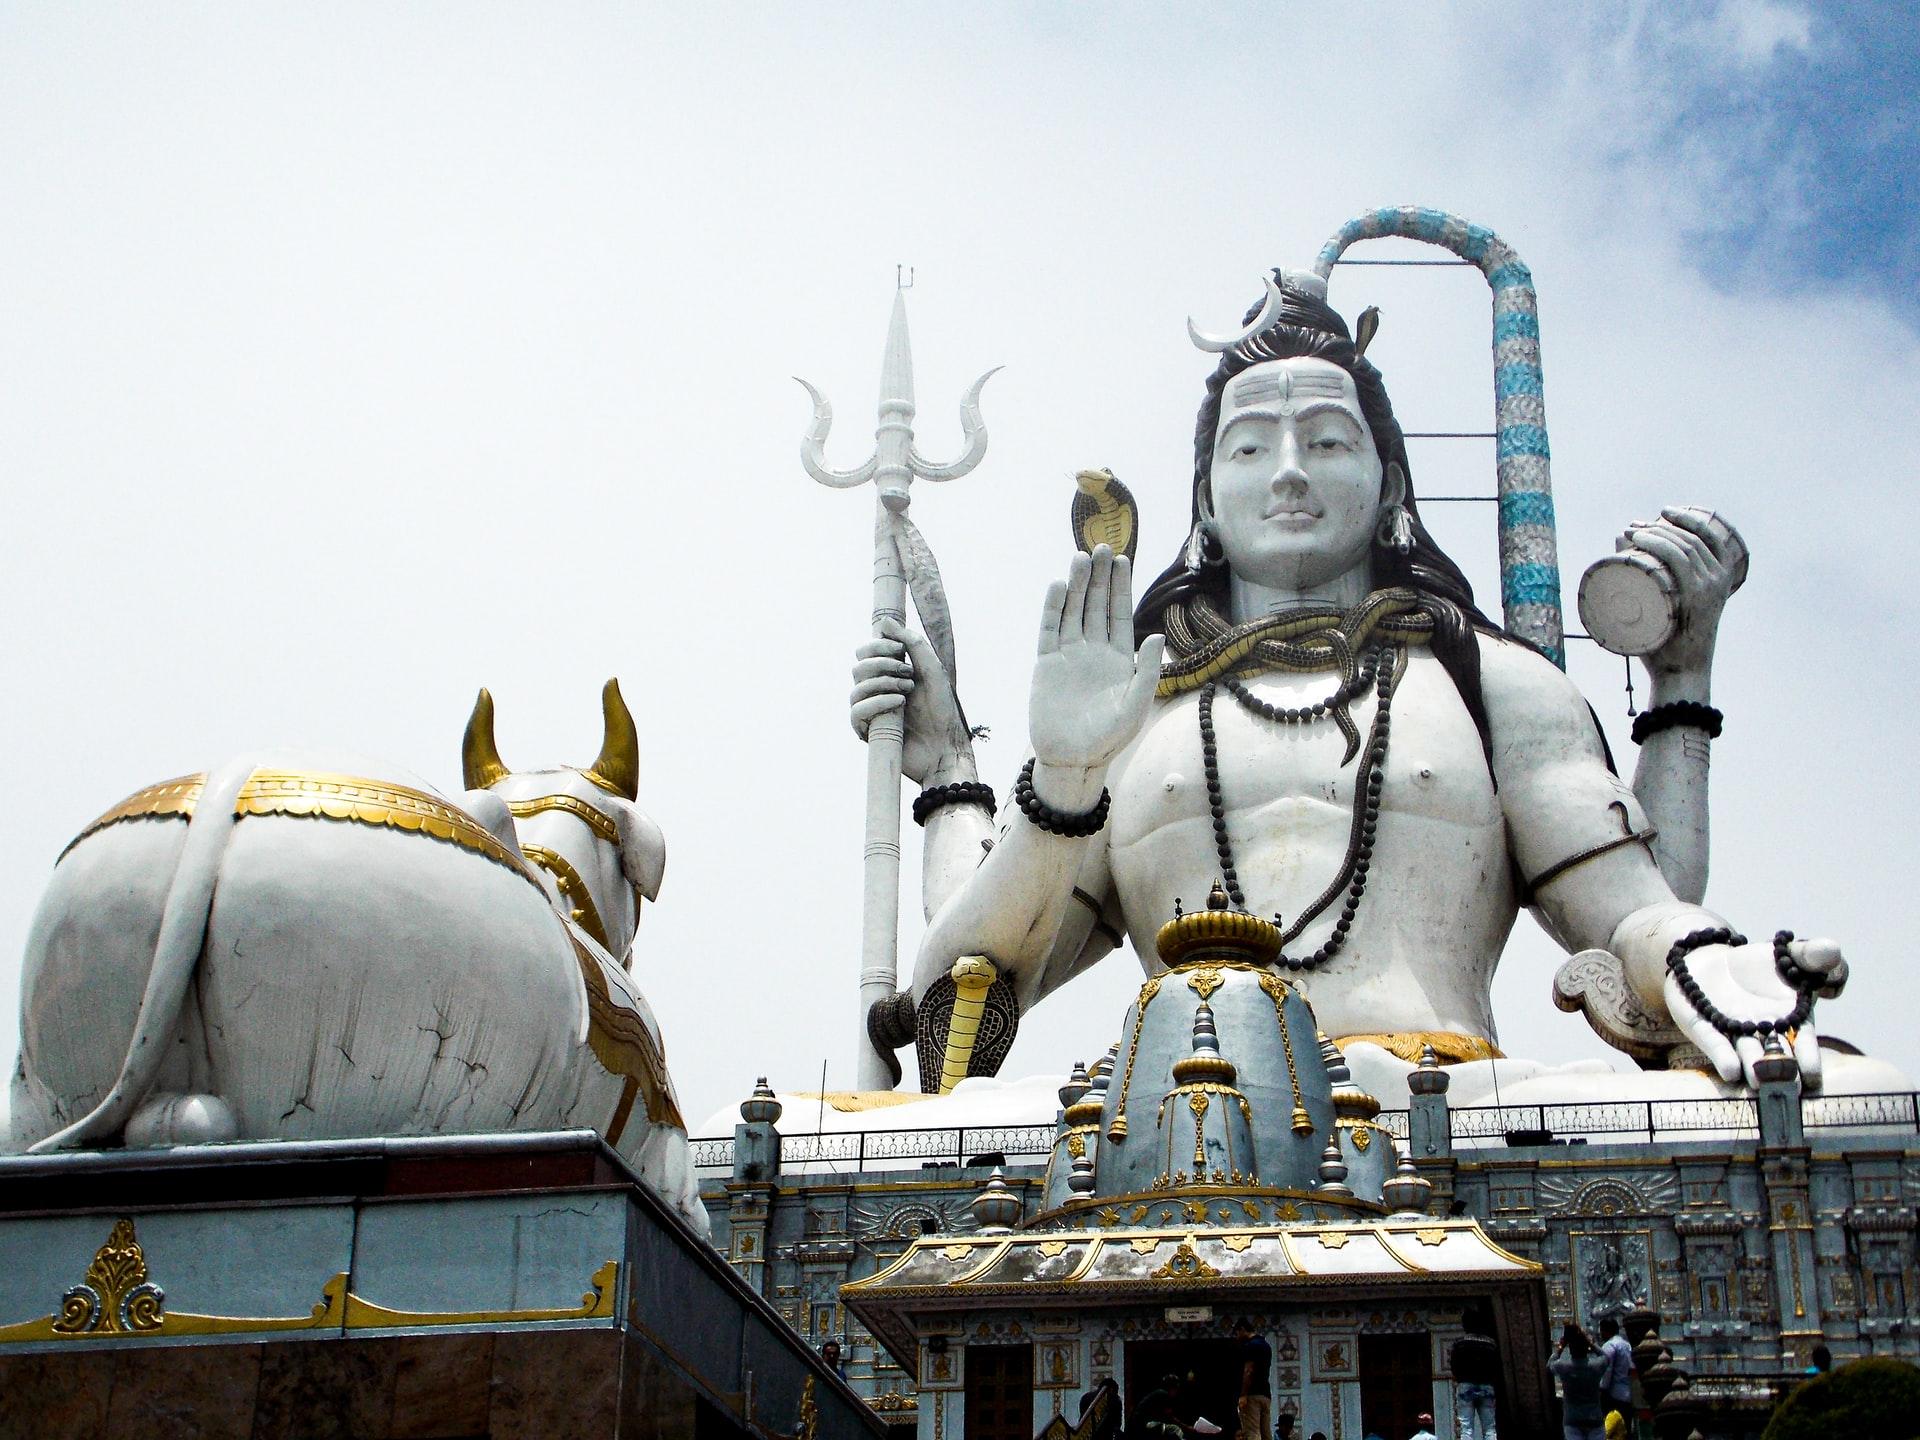 India targets minorities in push for Hindu Rashtra by 2024